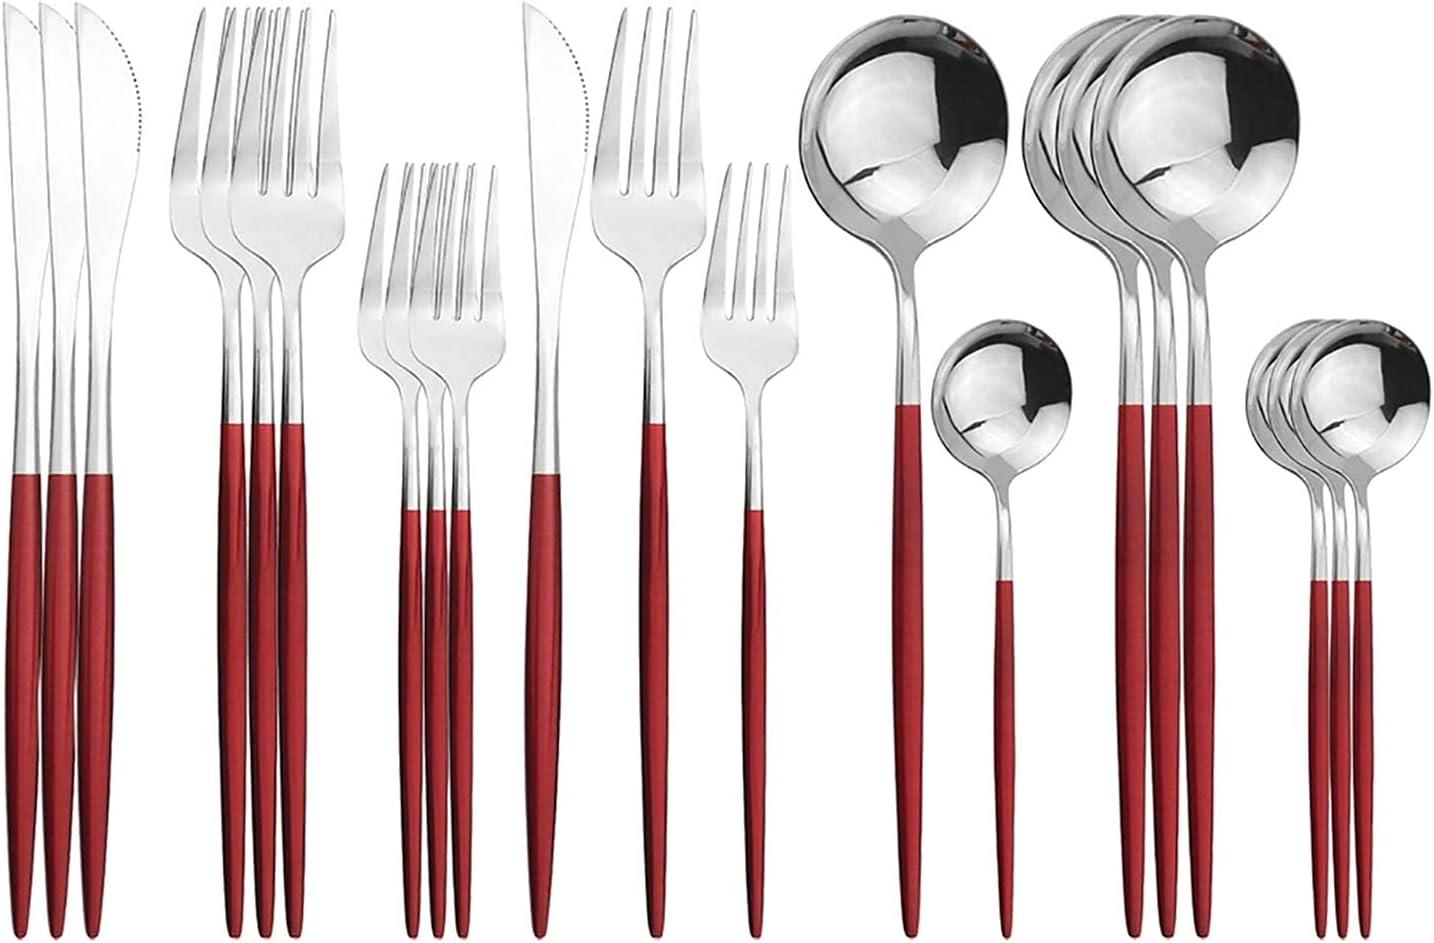 Silverware Set Mirror Trust Finish Cutlery 20-Piec Daily Tableware Now on sale